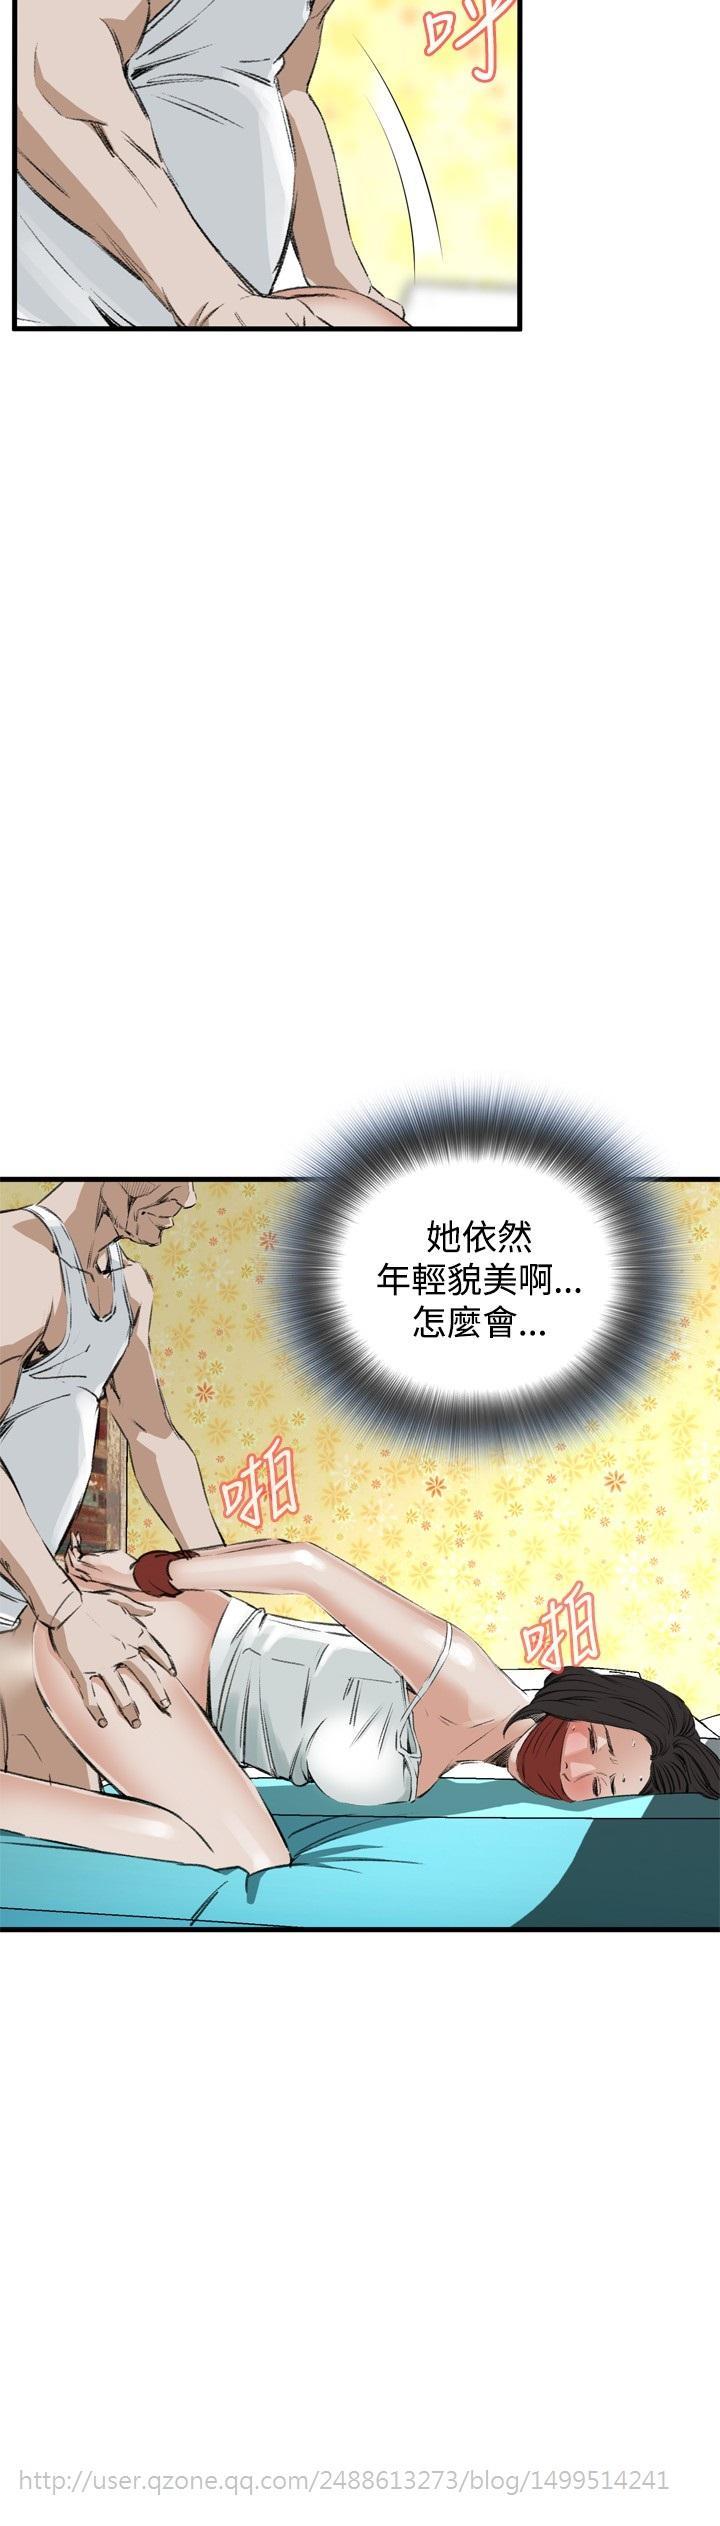 Take a Peek 偷窥 Ch.39~55 [Chinese]中文 162